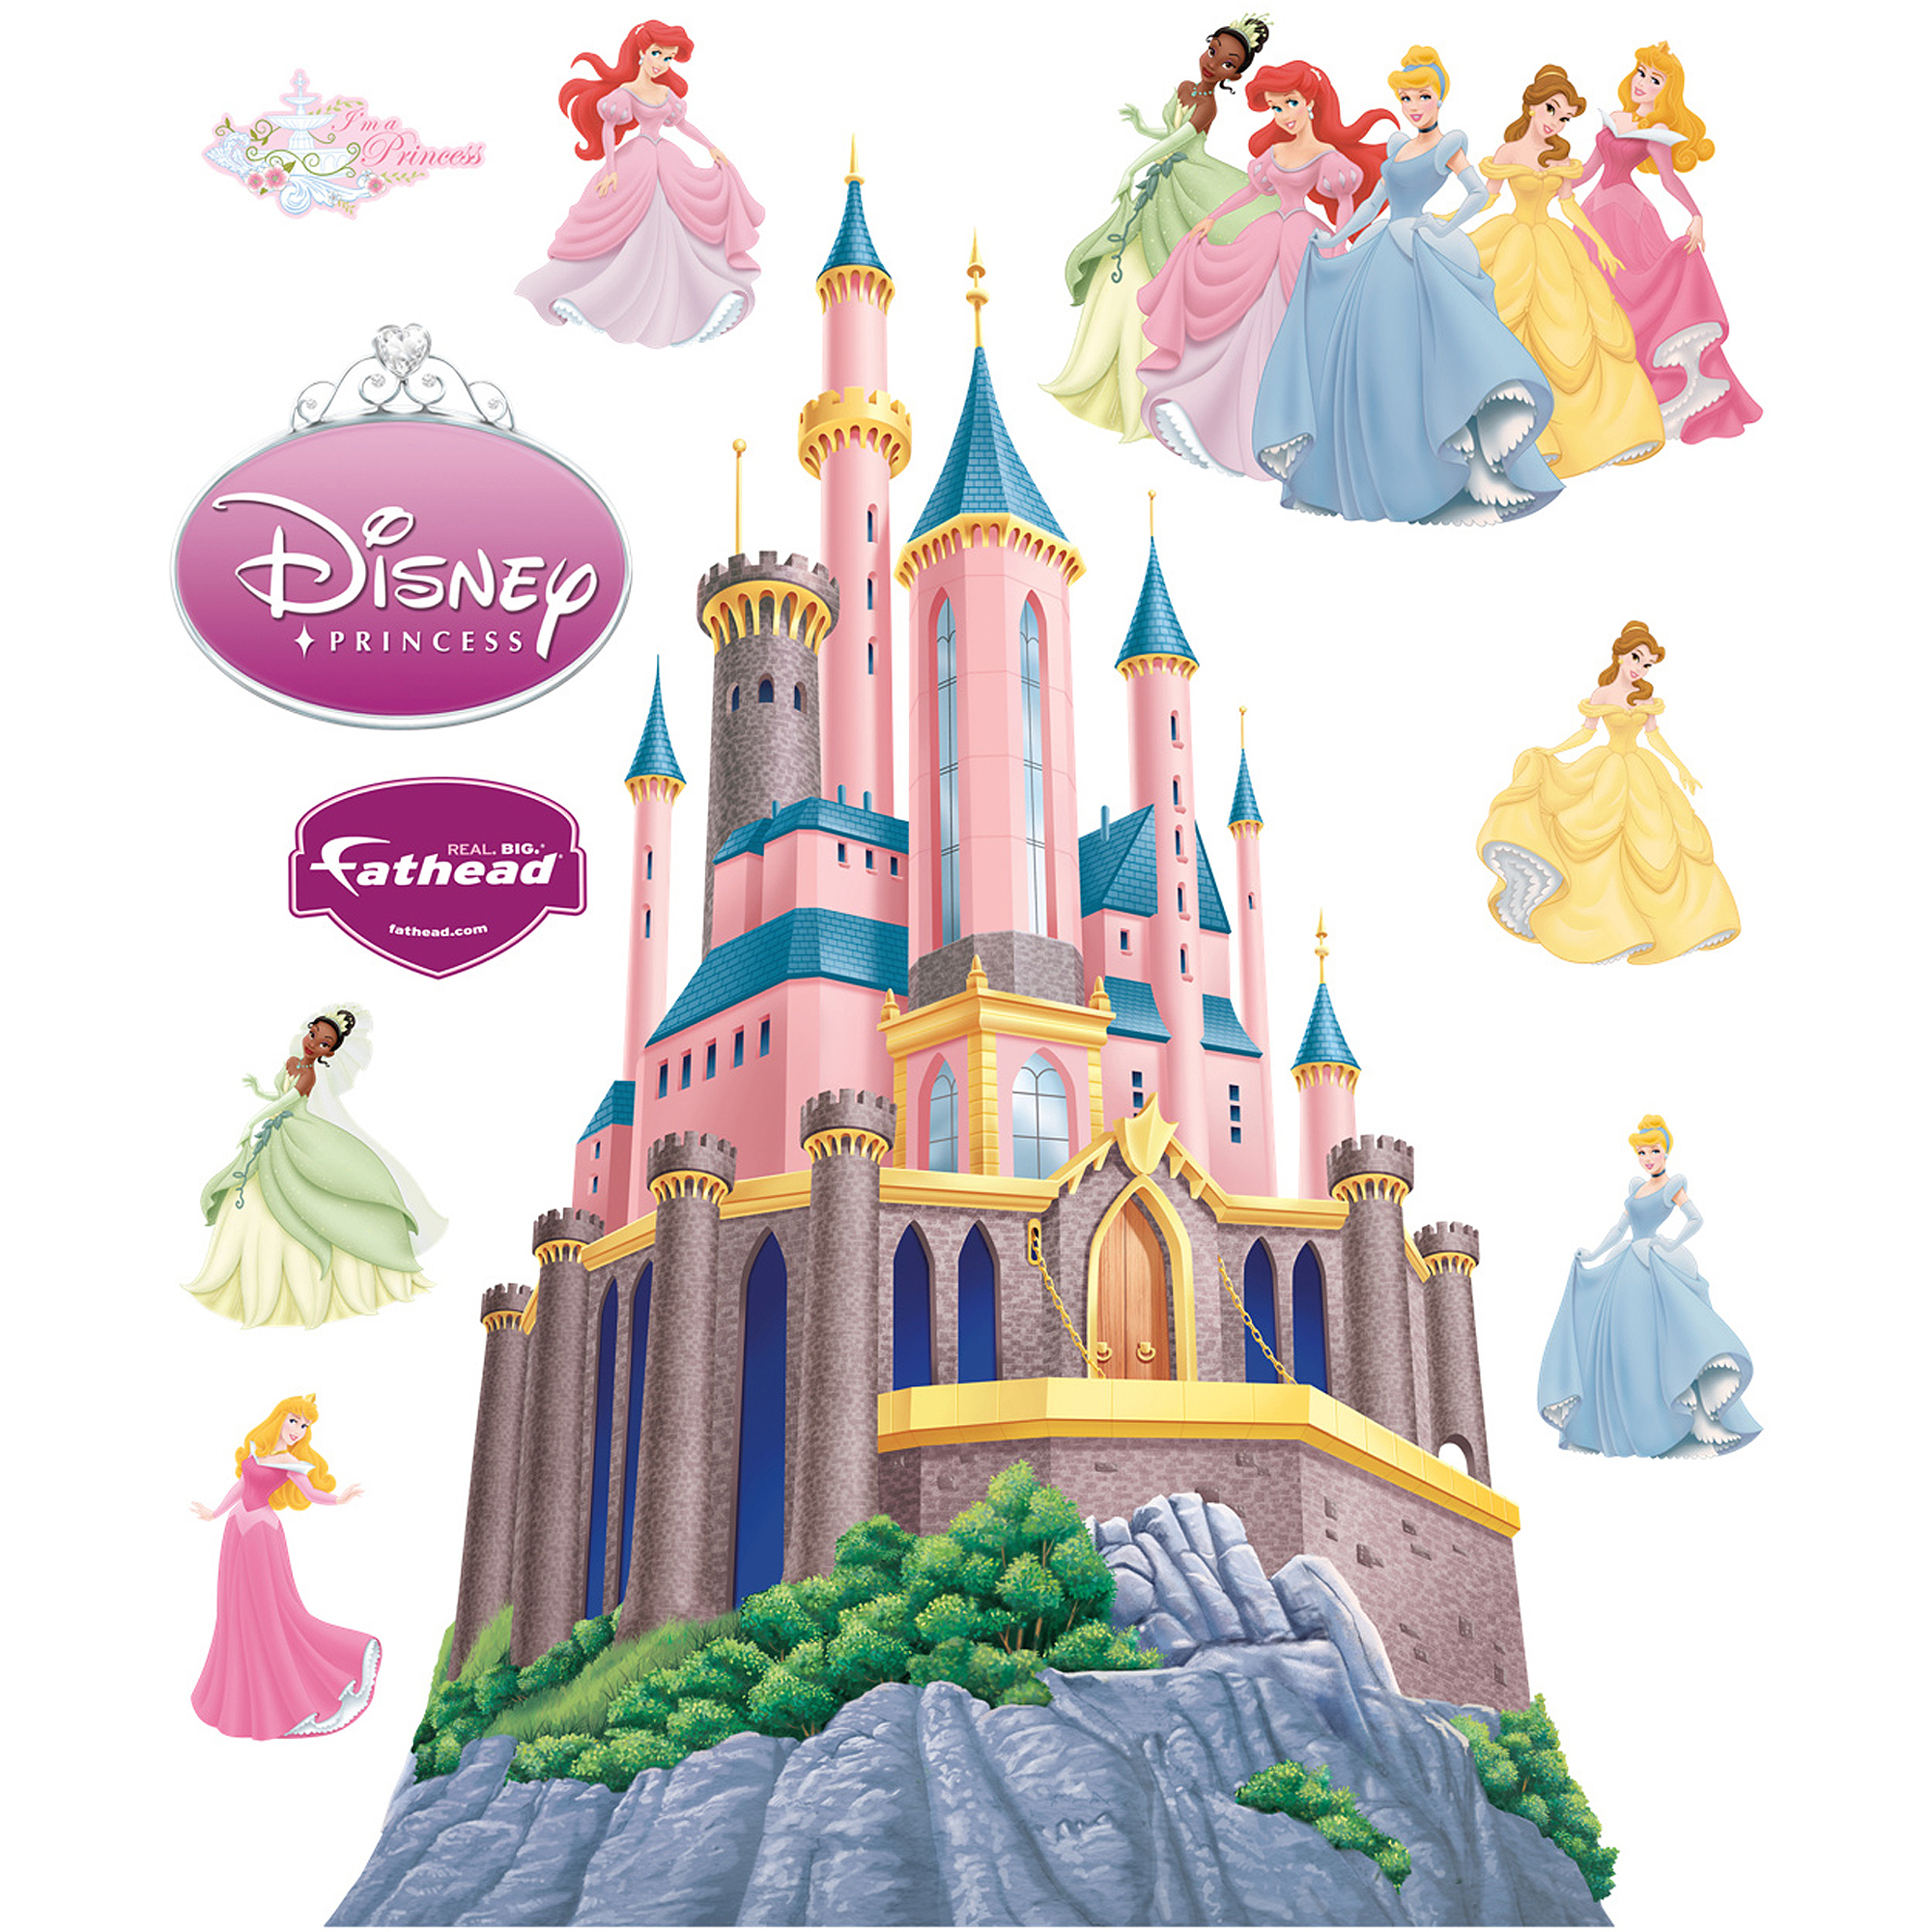 Fathead Disney Princesses Castle